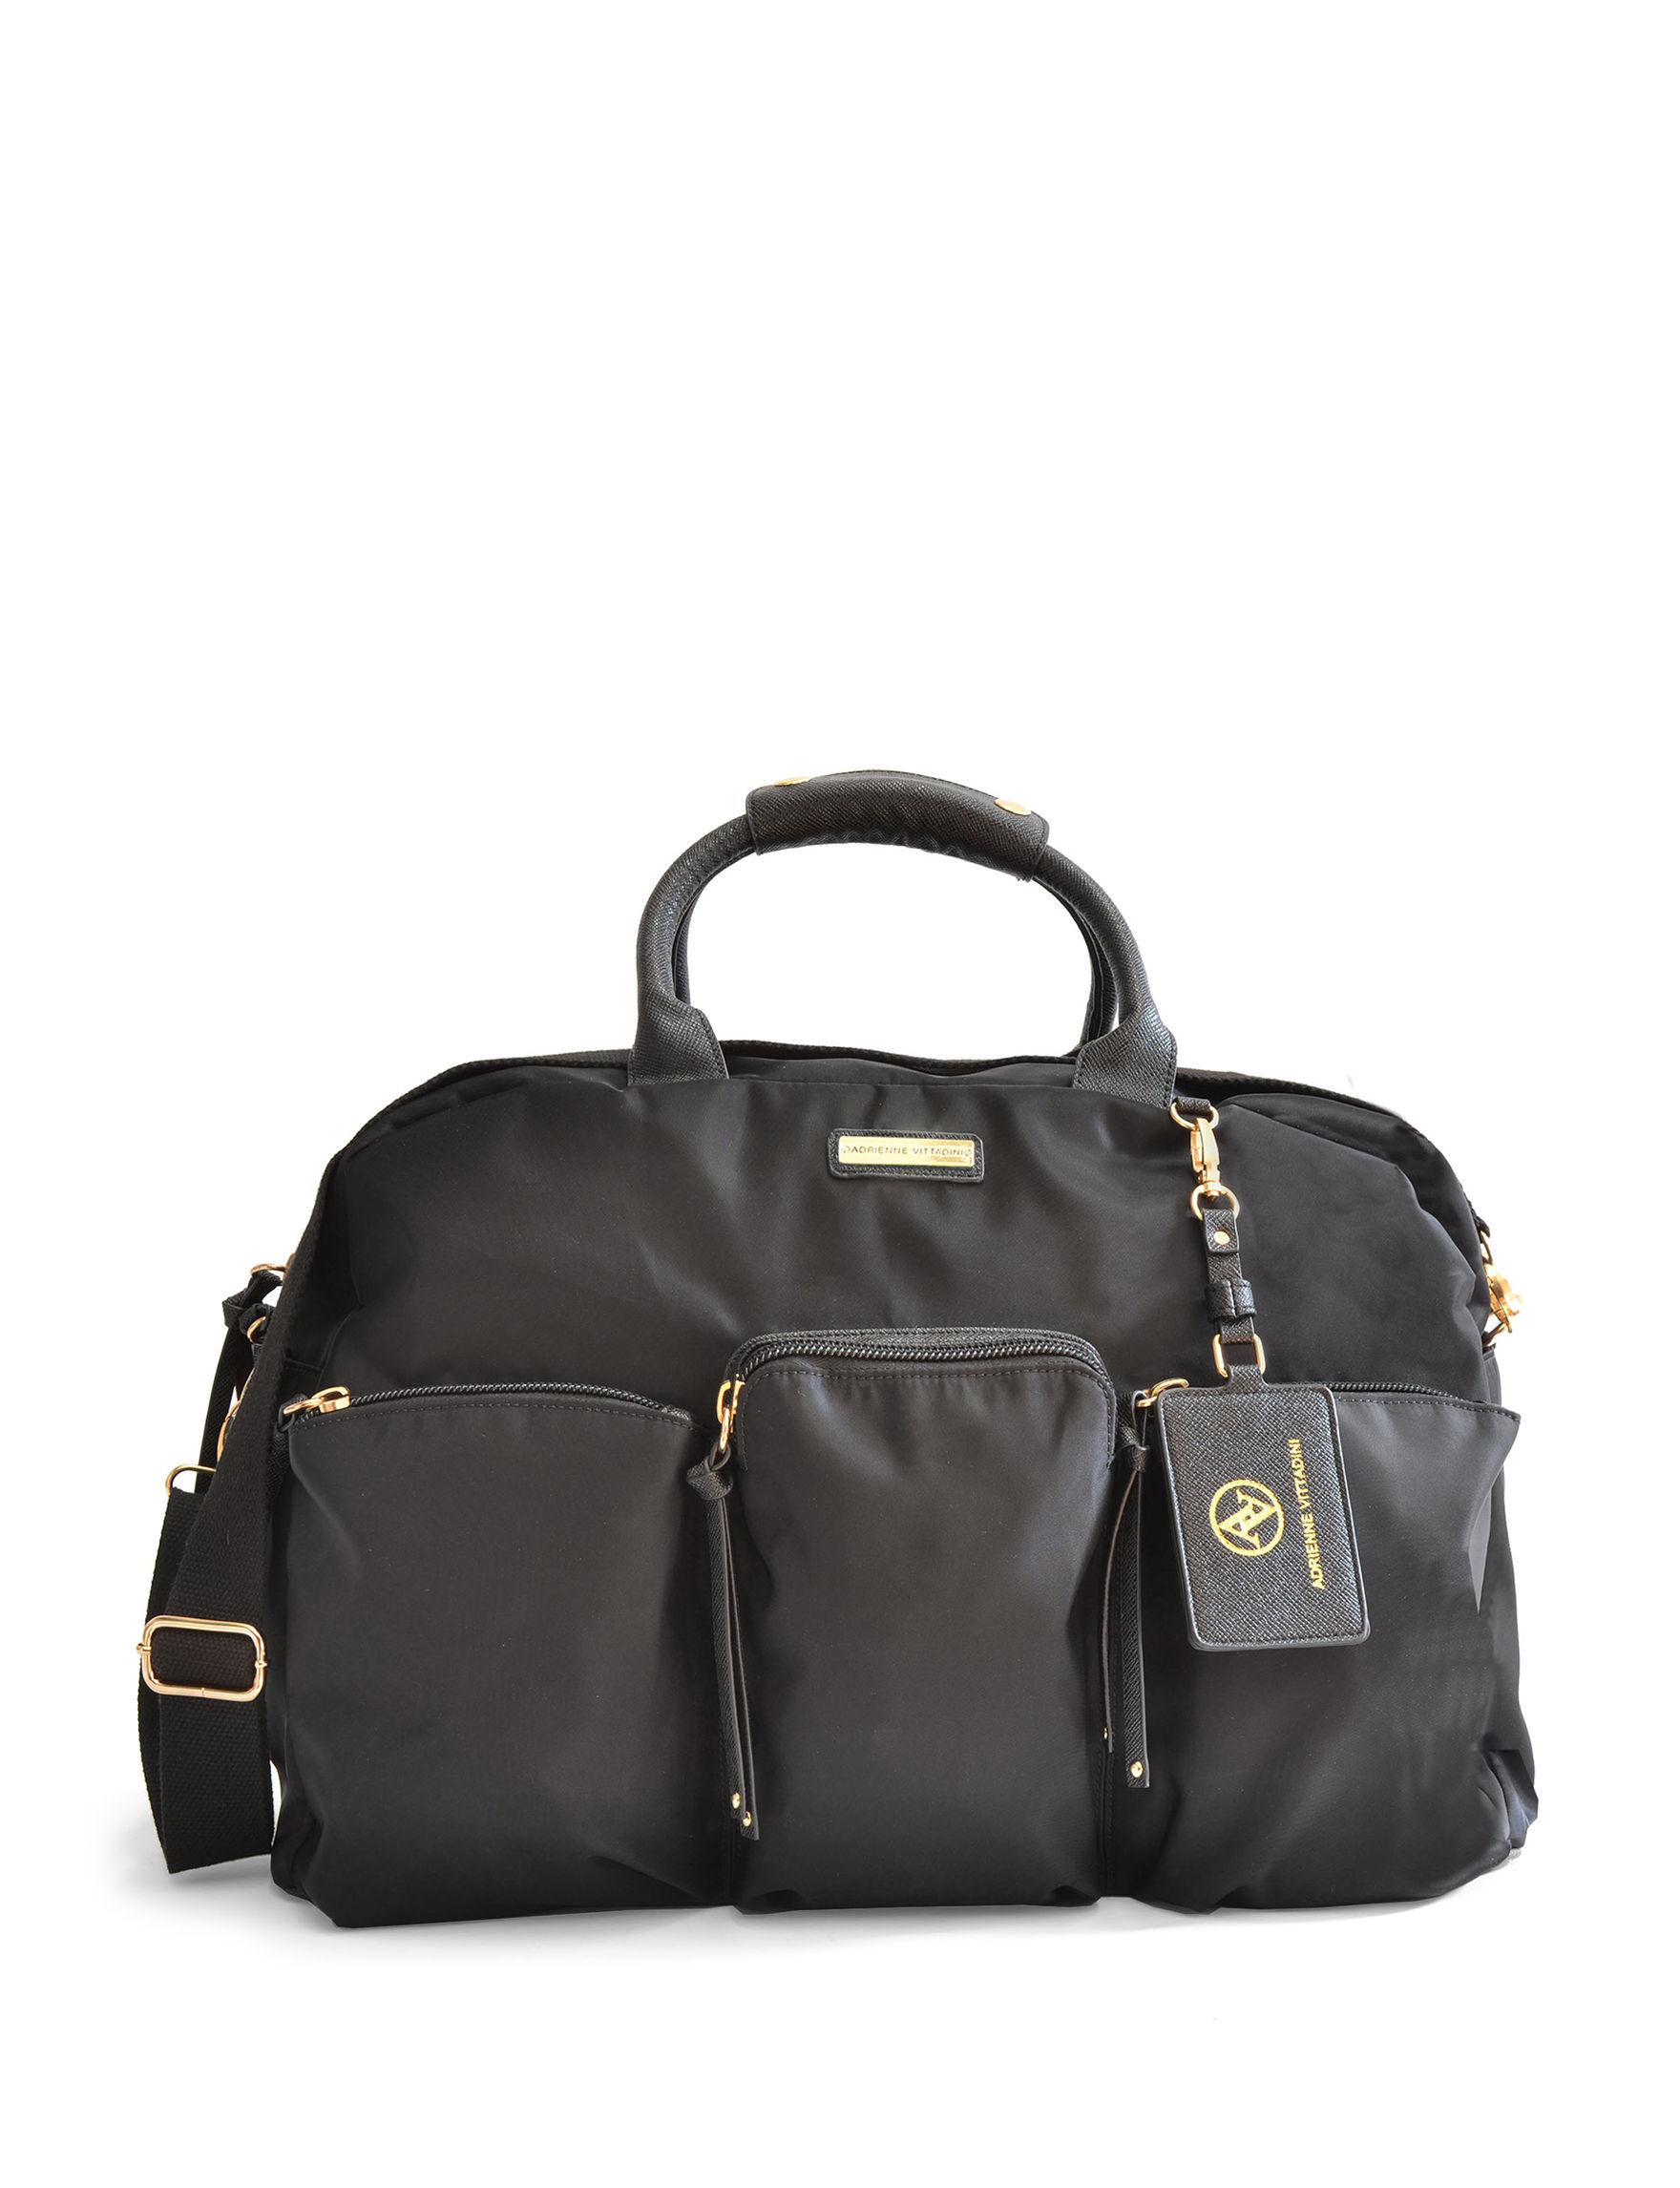 Adrienne Vittadini Black Duffle Bags